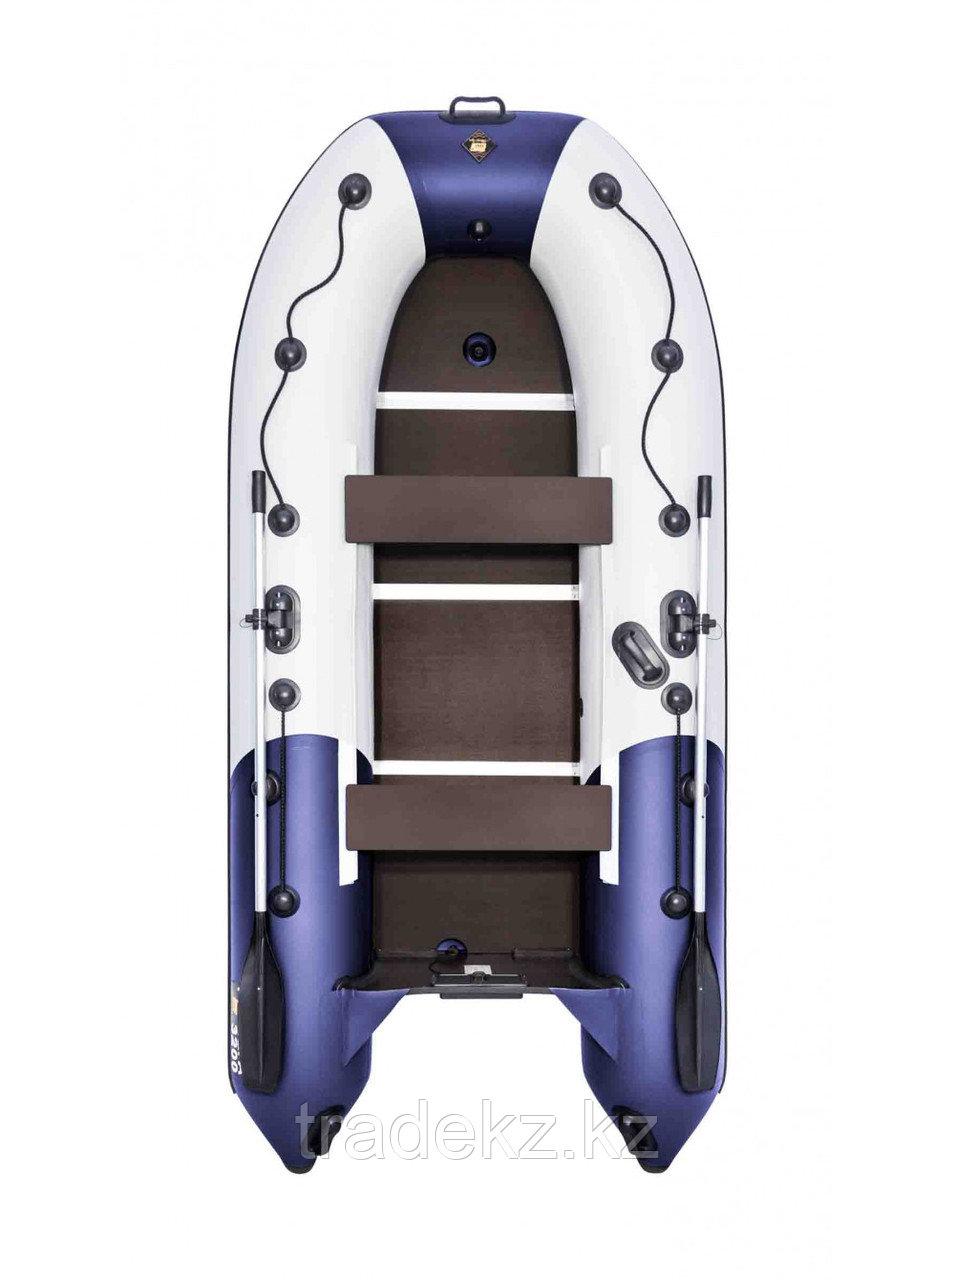 Лодка ПВХ Ривьера Компакт 3200 СК комби светло-серый/синий